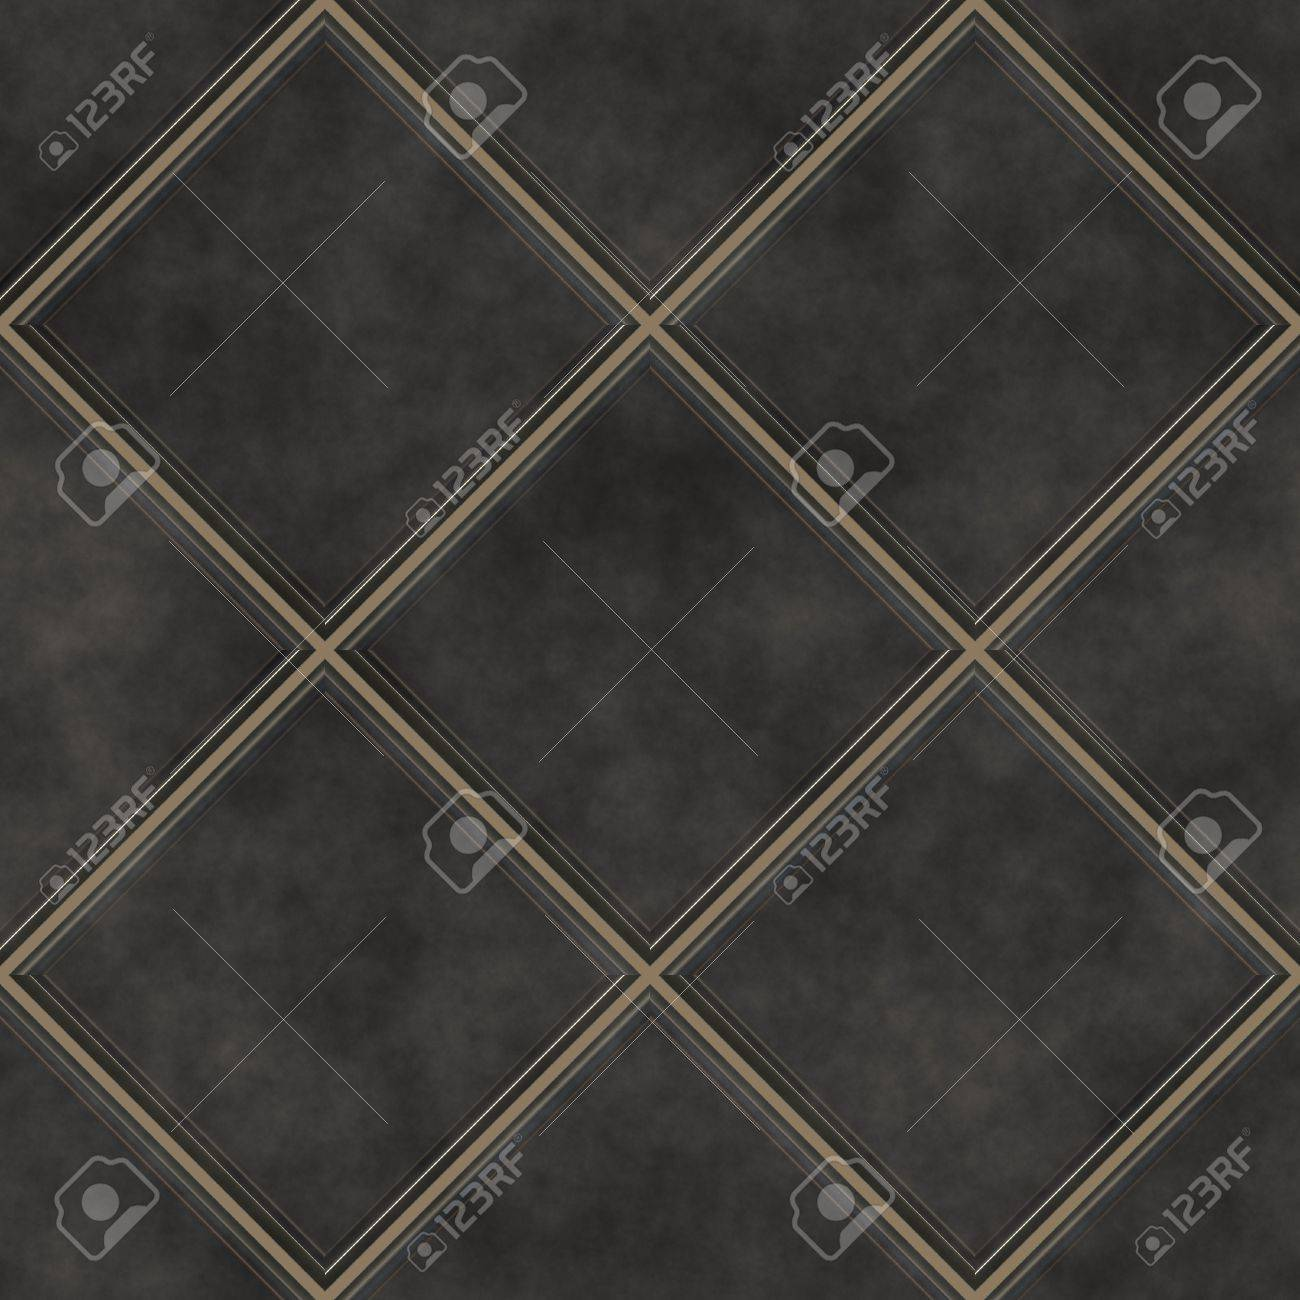 Black tile floor texture Vitrified Seamless Black Tiles Texture Background Kitchen Or Bathroom Concept Stock Photo 7306519 123rfcom Seamless Black Tiles Texture Background Kitchen Or Bathroom Stock